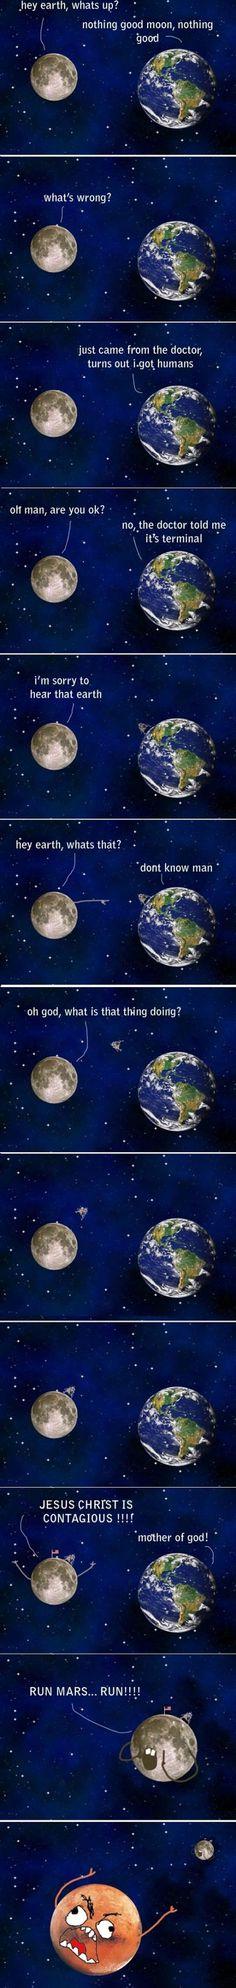 cool-Earth-moon-Mars-humans